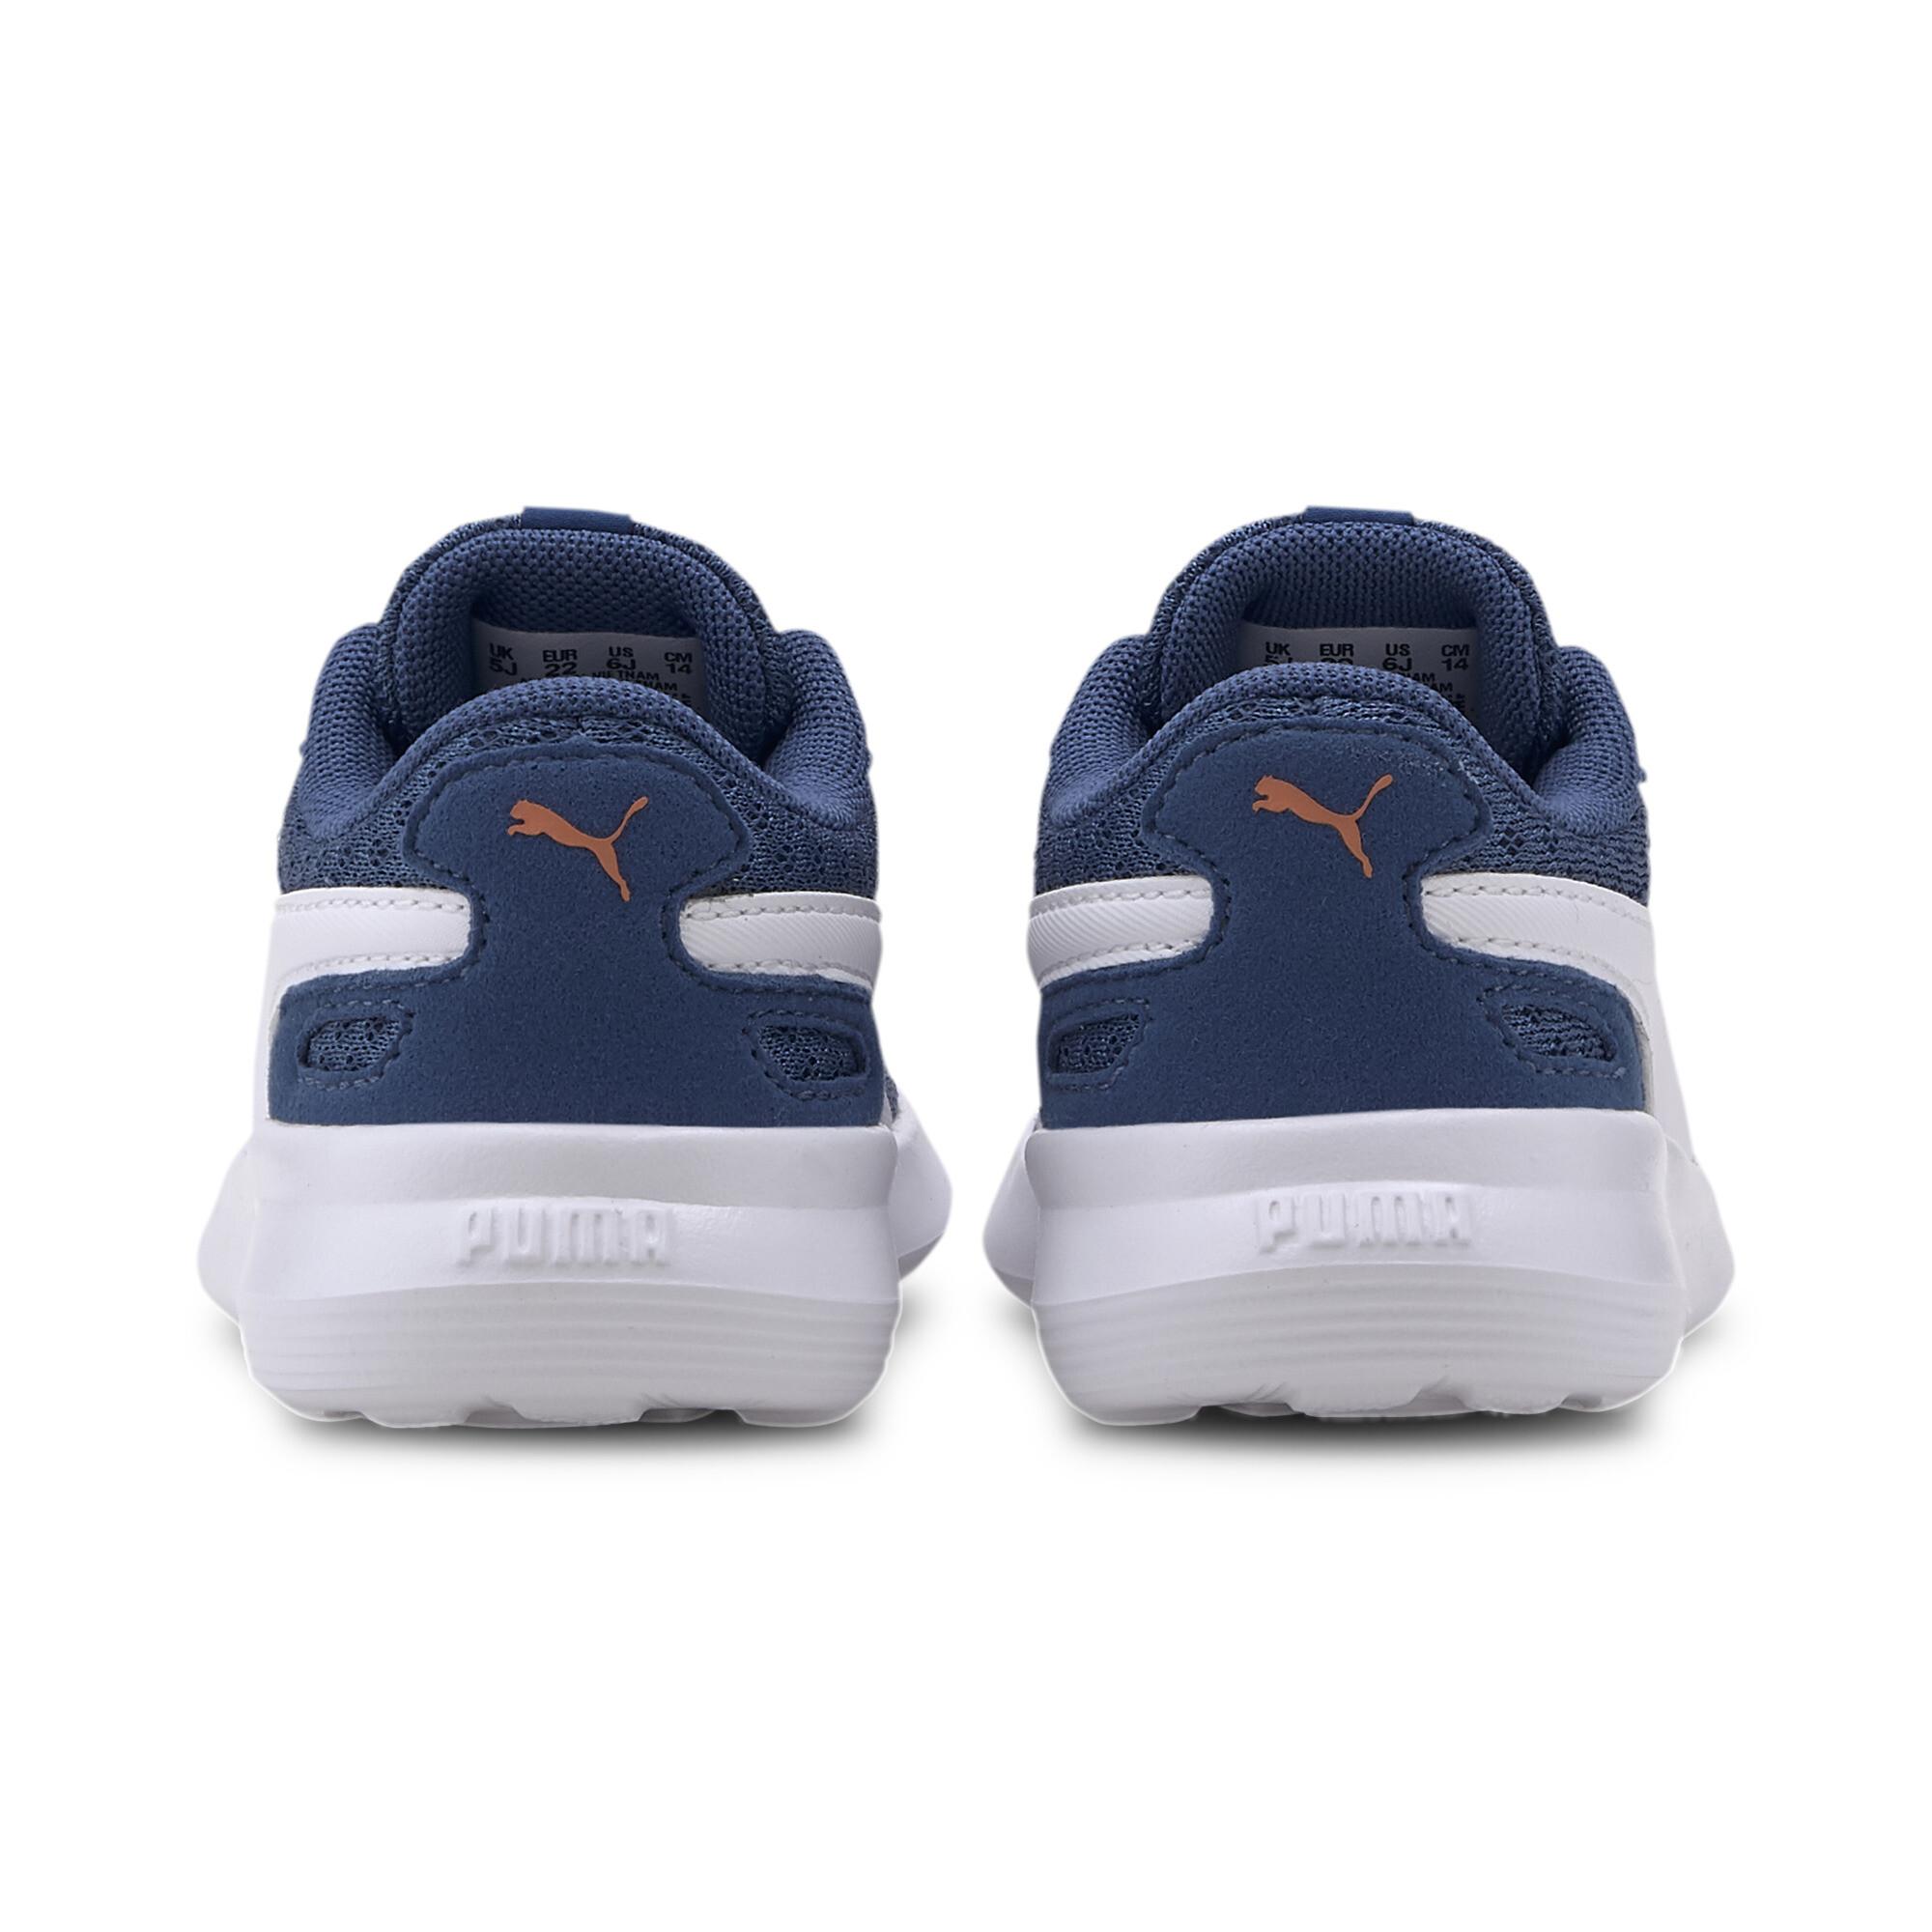 PUMA-ST-Activate-AC-Toddler-Shoes-Kids-Shoe-Kids thumbnail 12